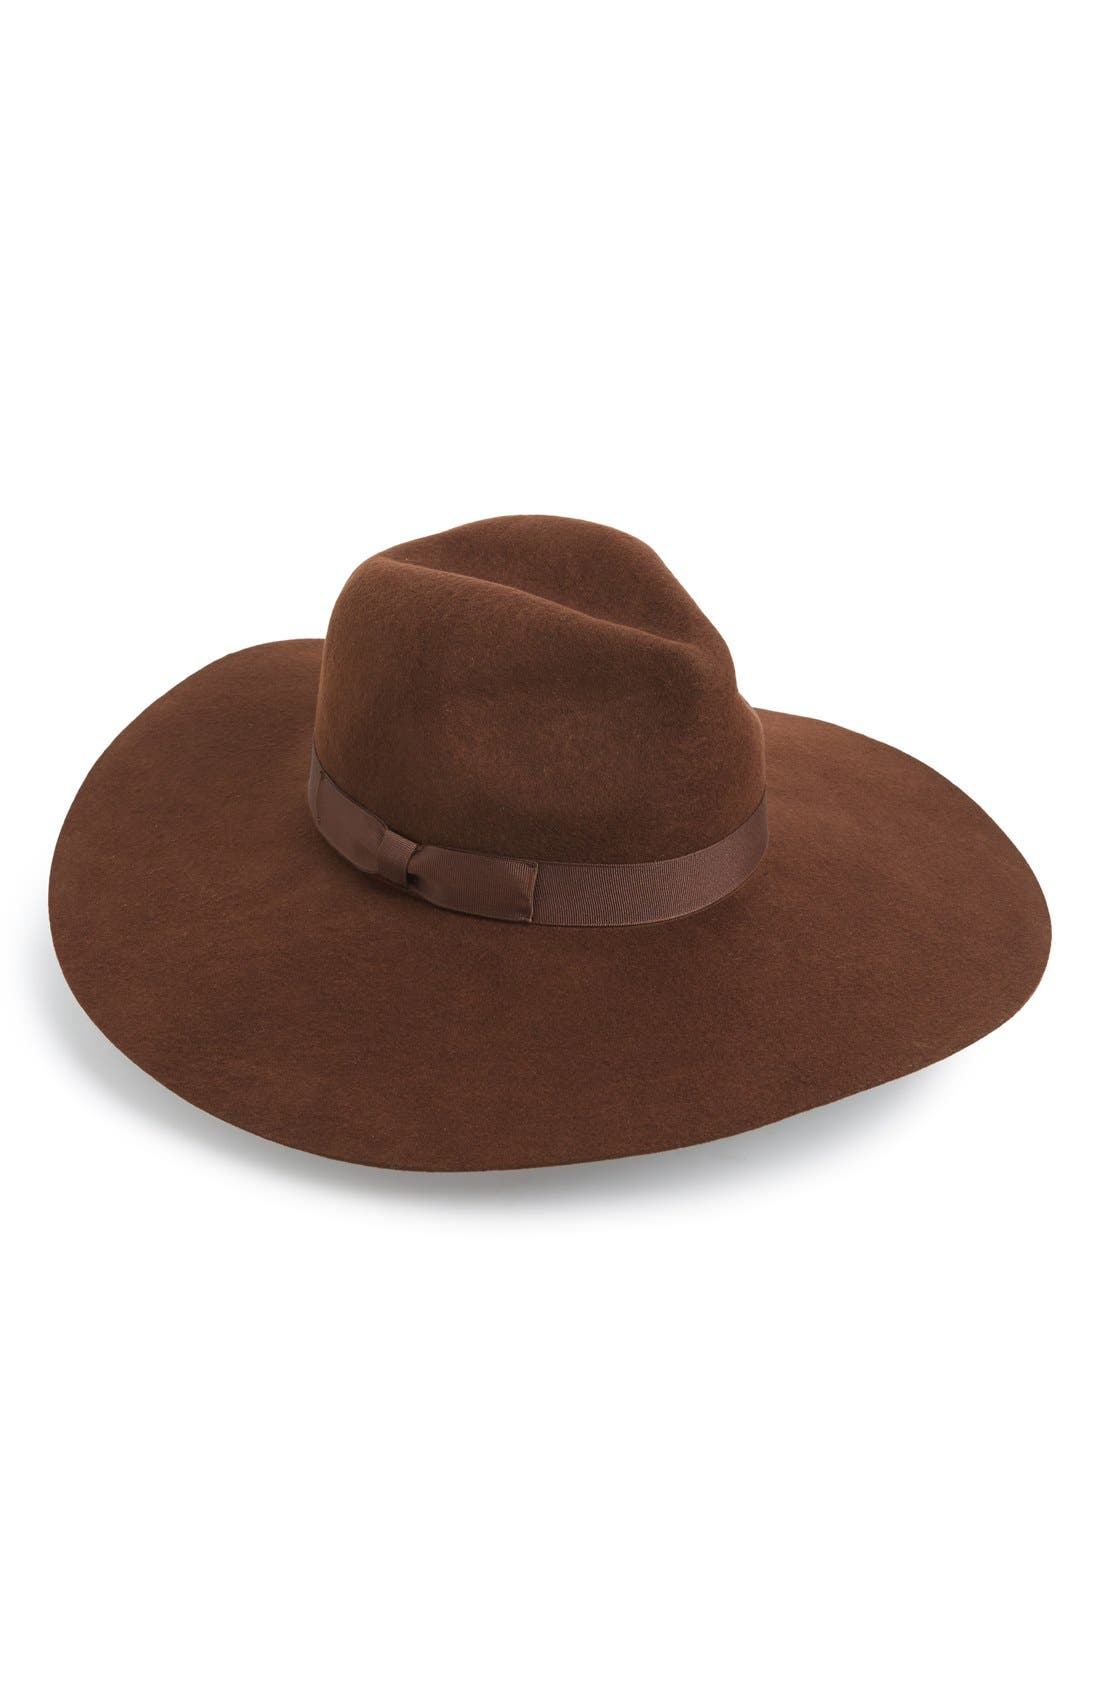 Main Image - Lack of Color 'Montana Coco' Floppy Felt Hat